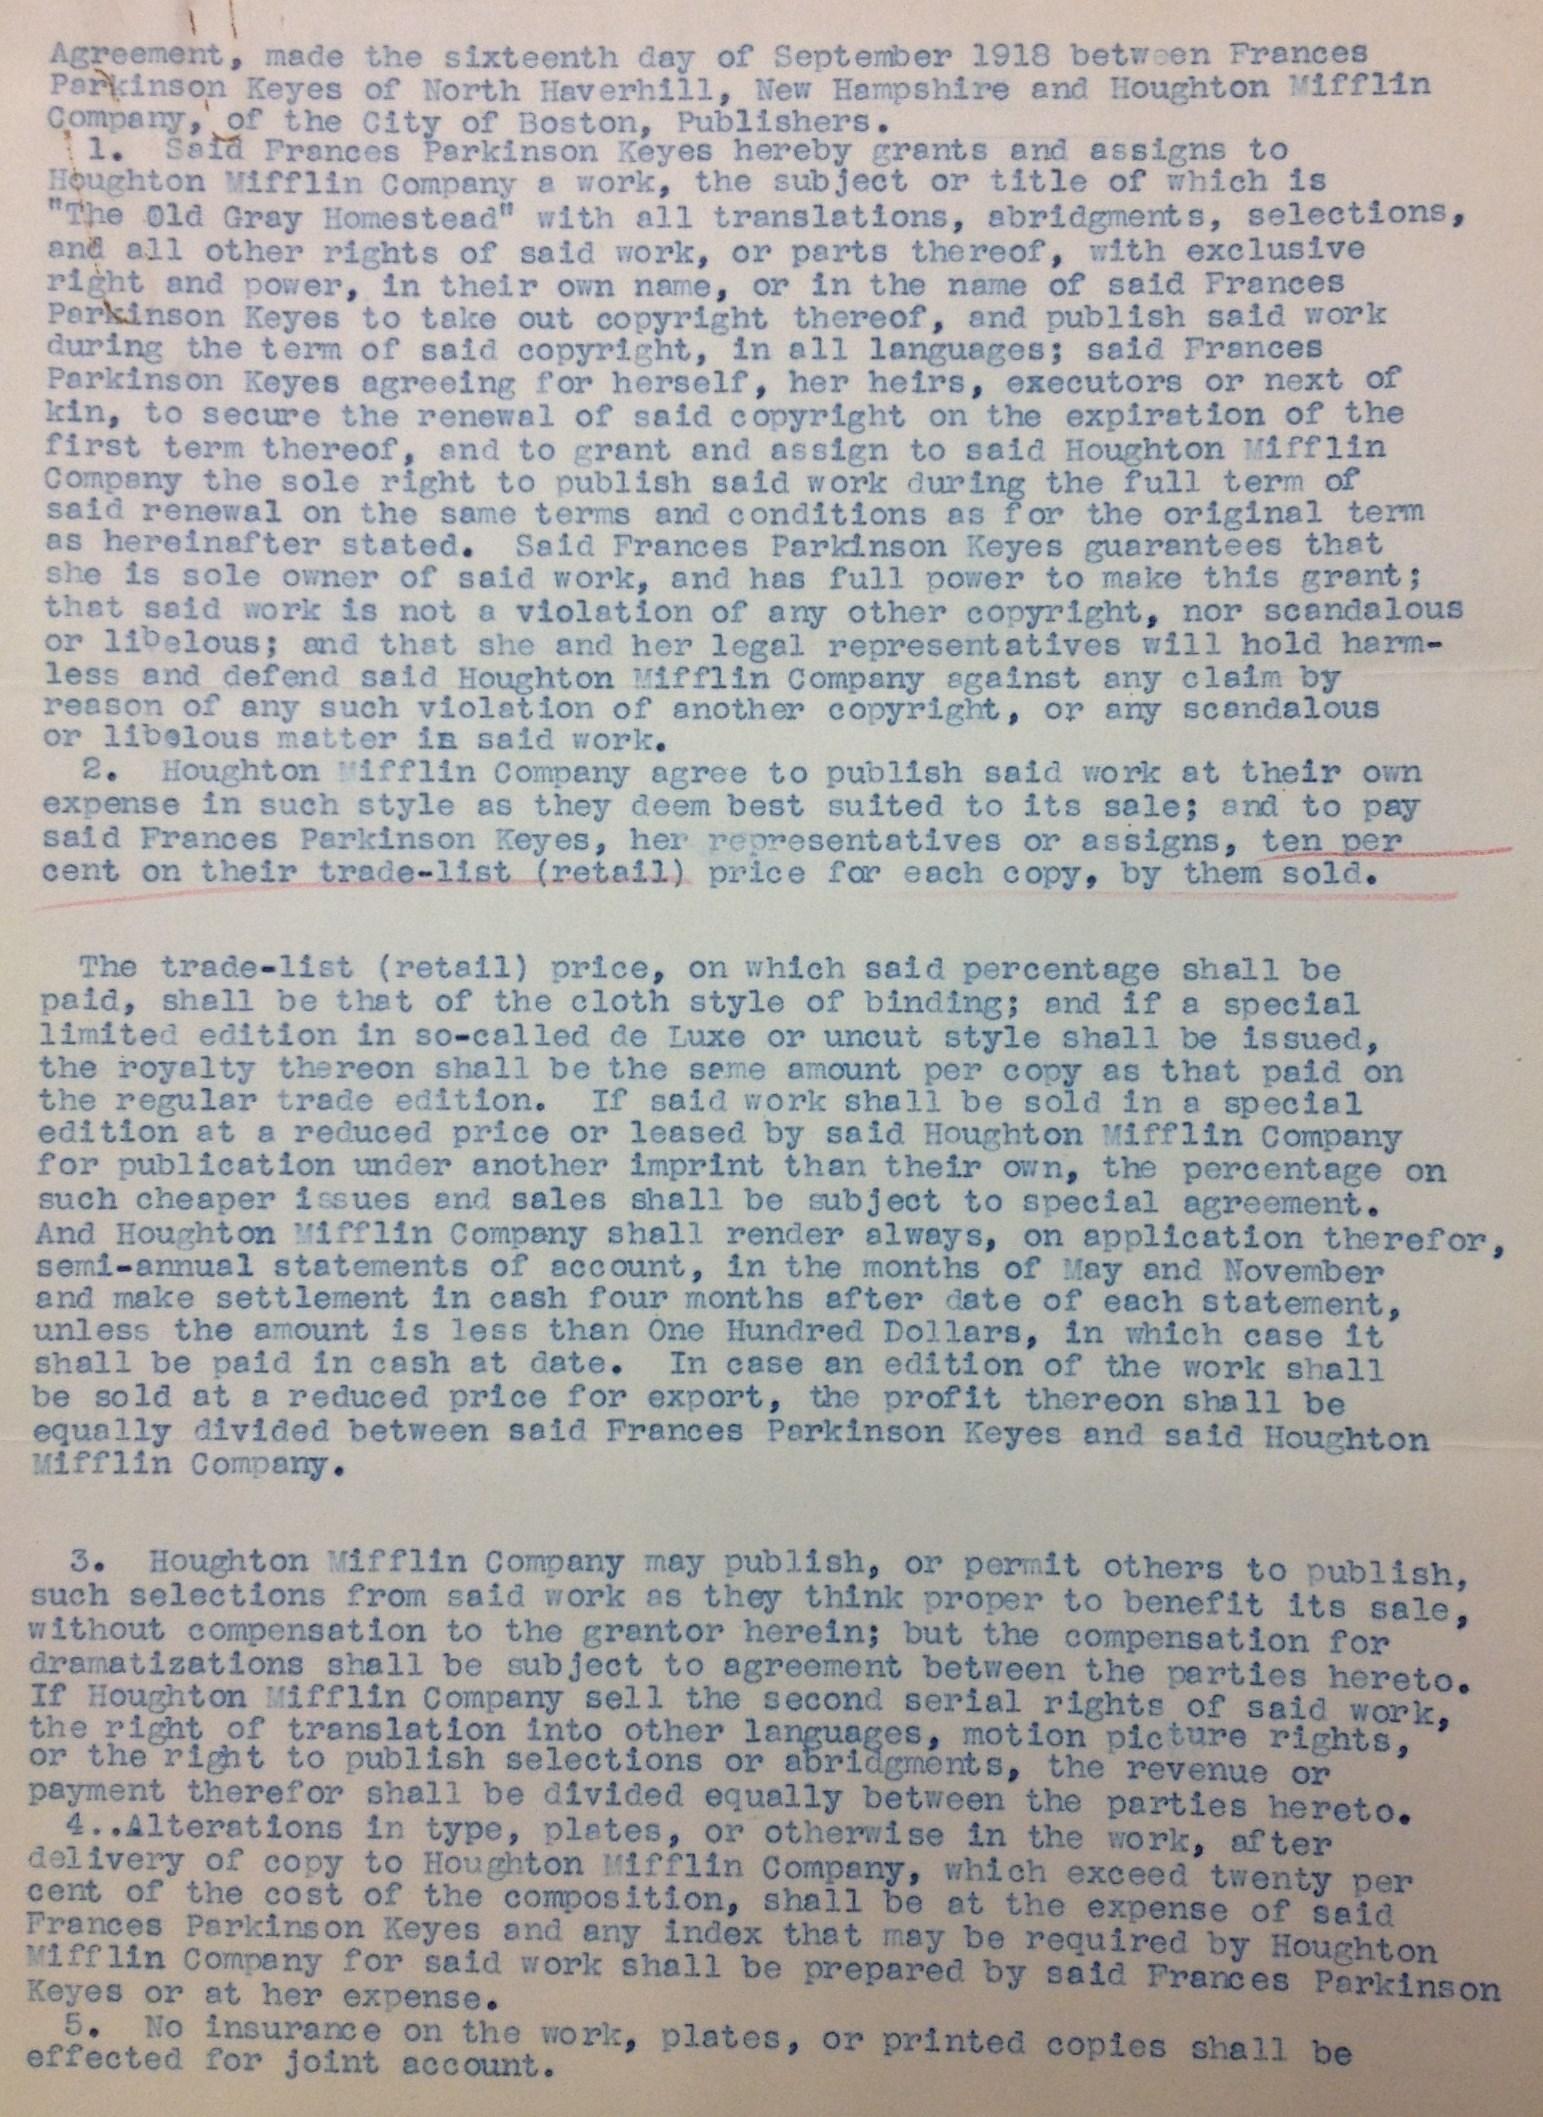 fpk-1918-contract-draft-old-grey-1.jpg